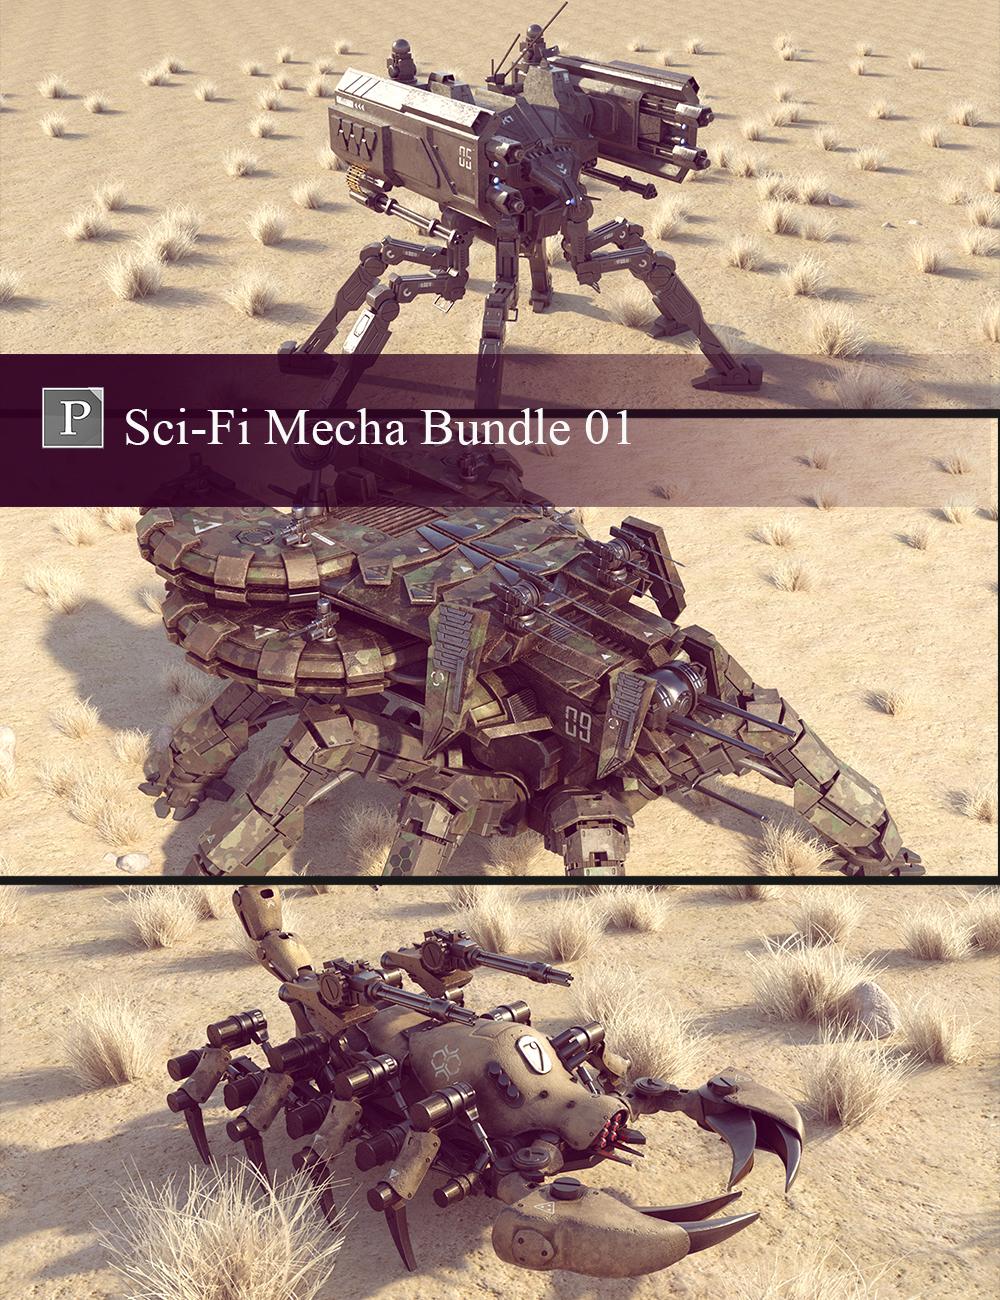 Sci-Fi Mecha Bundle 01 by: Polish, 3D Models by Daz 3D